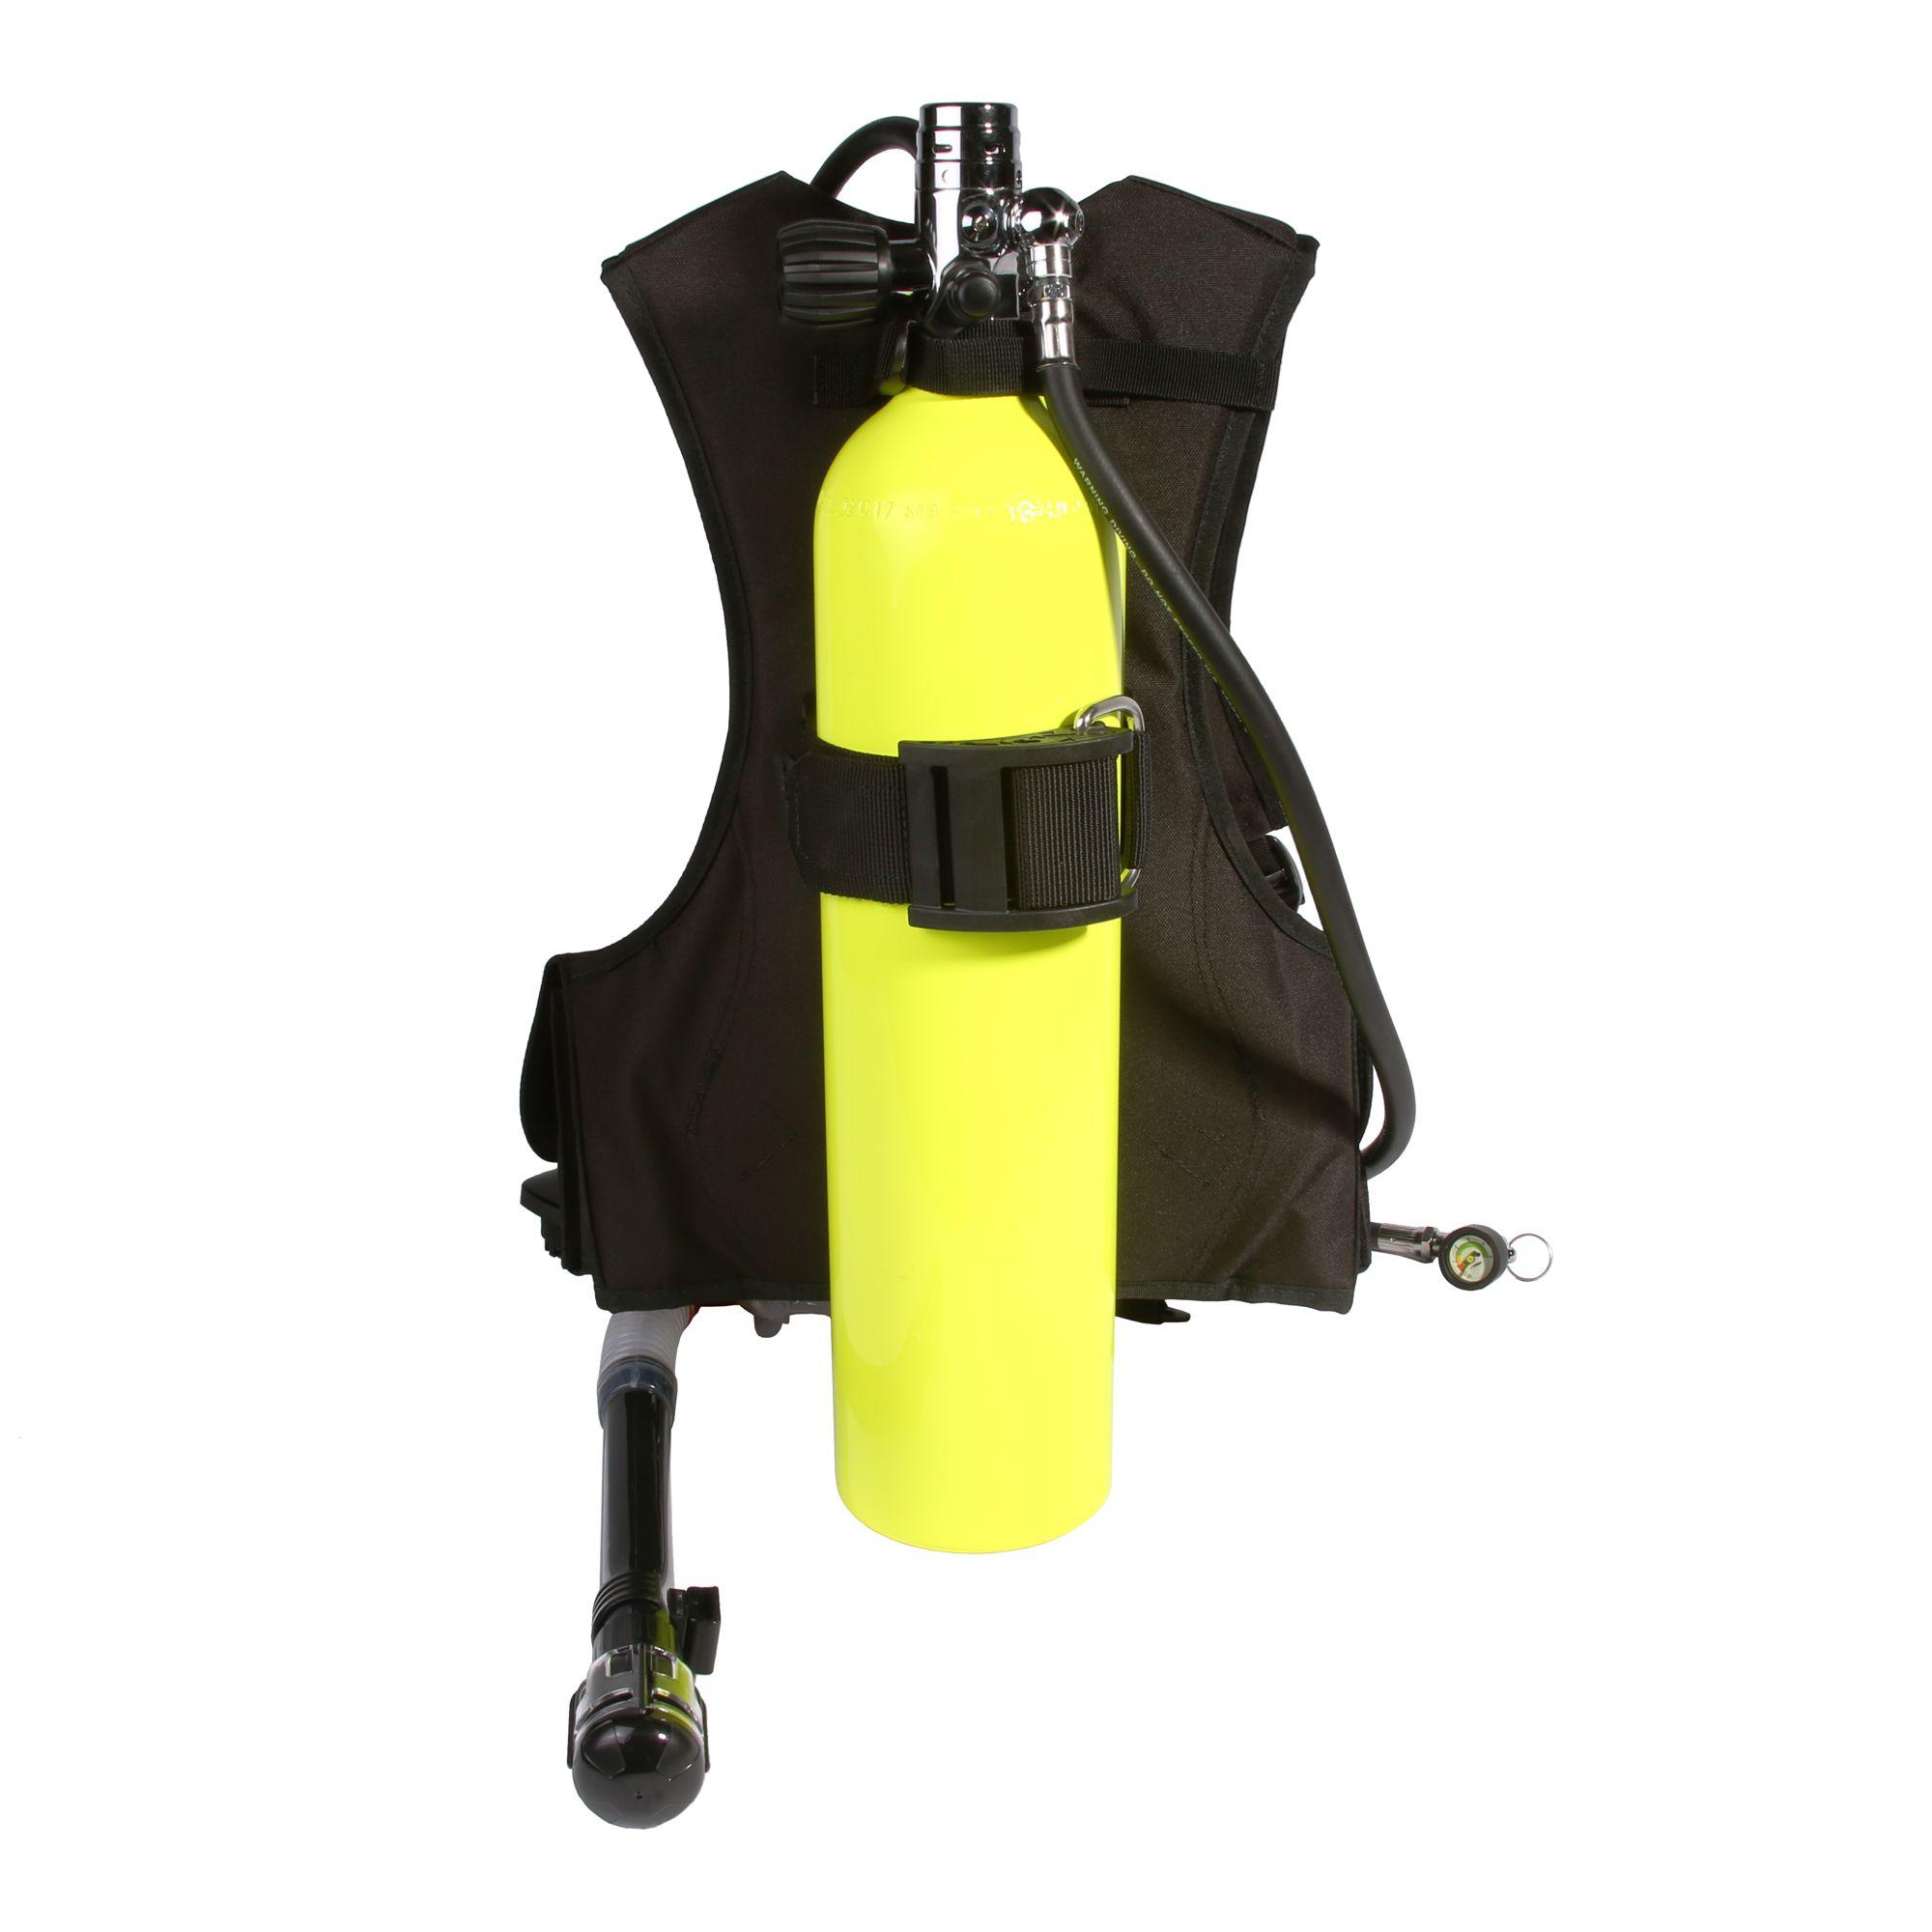 New! EasyDive Kit with Snorkelator